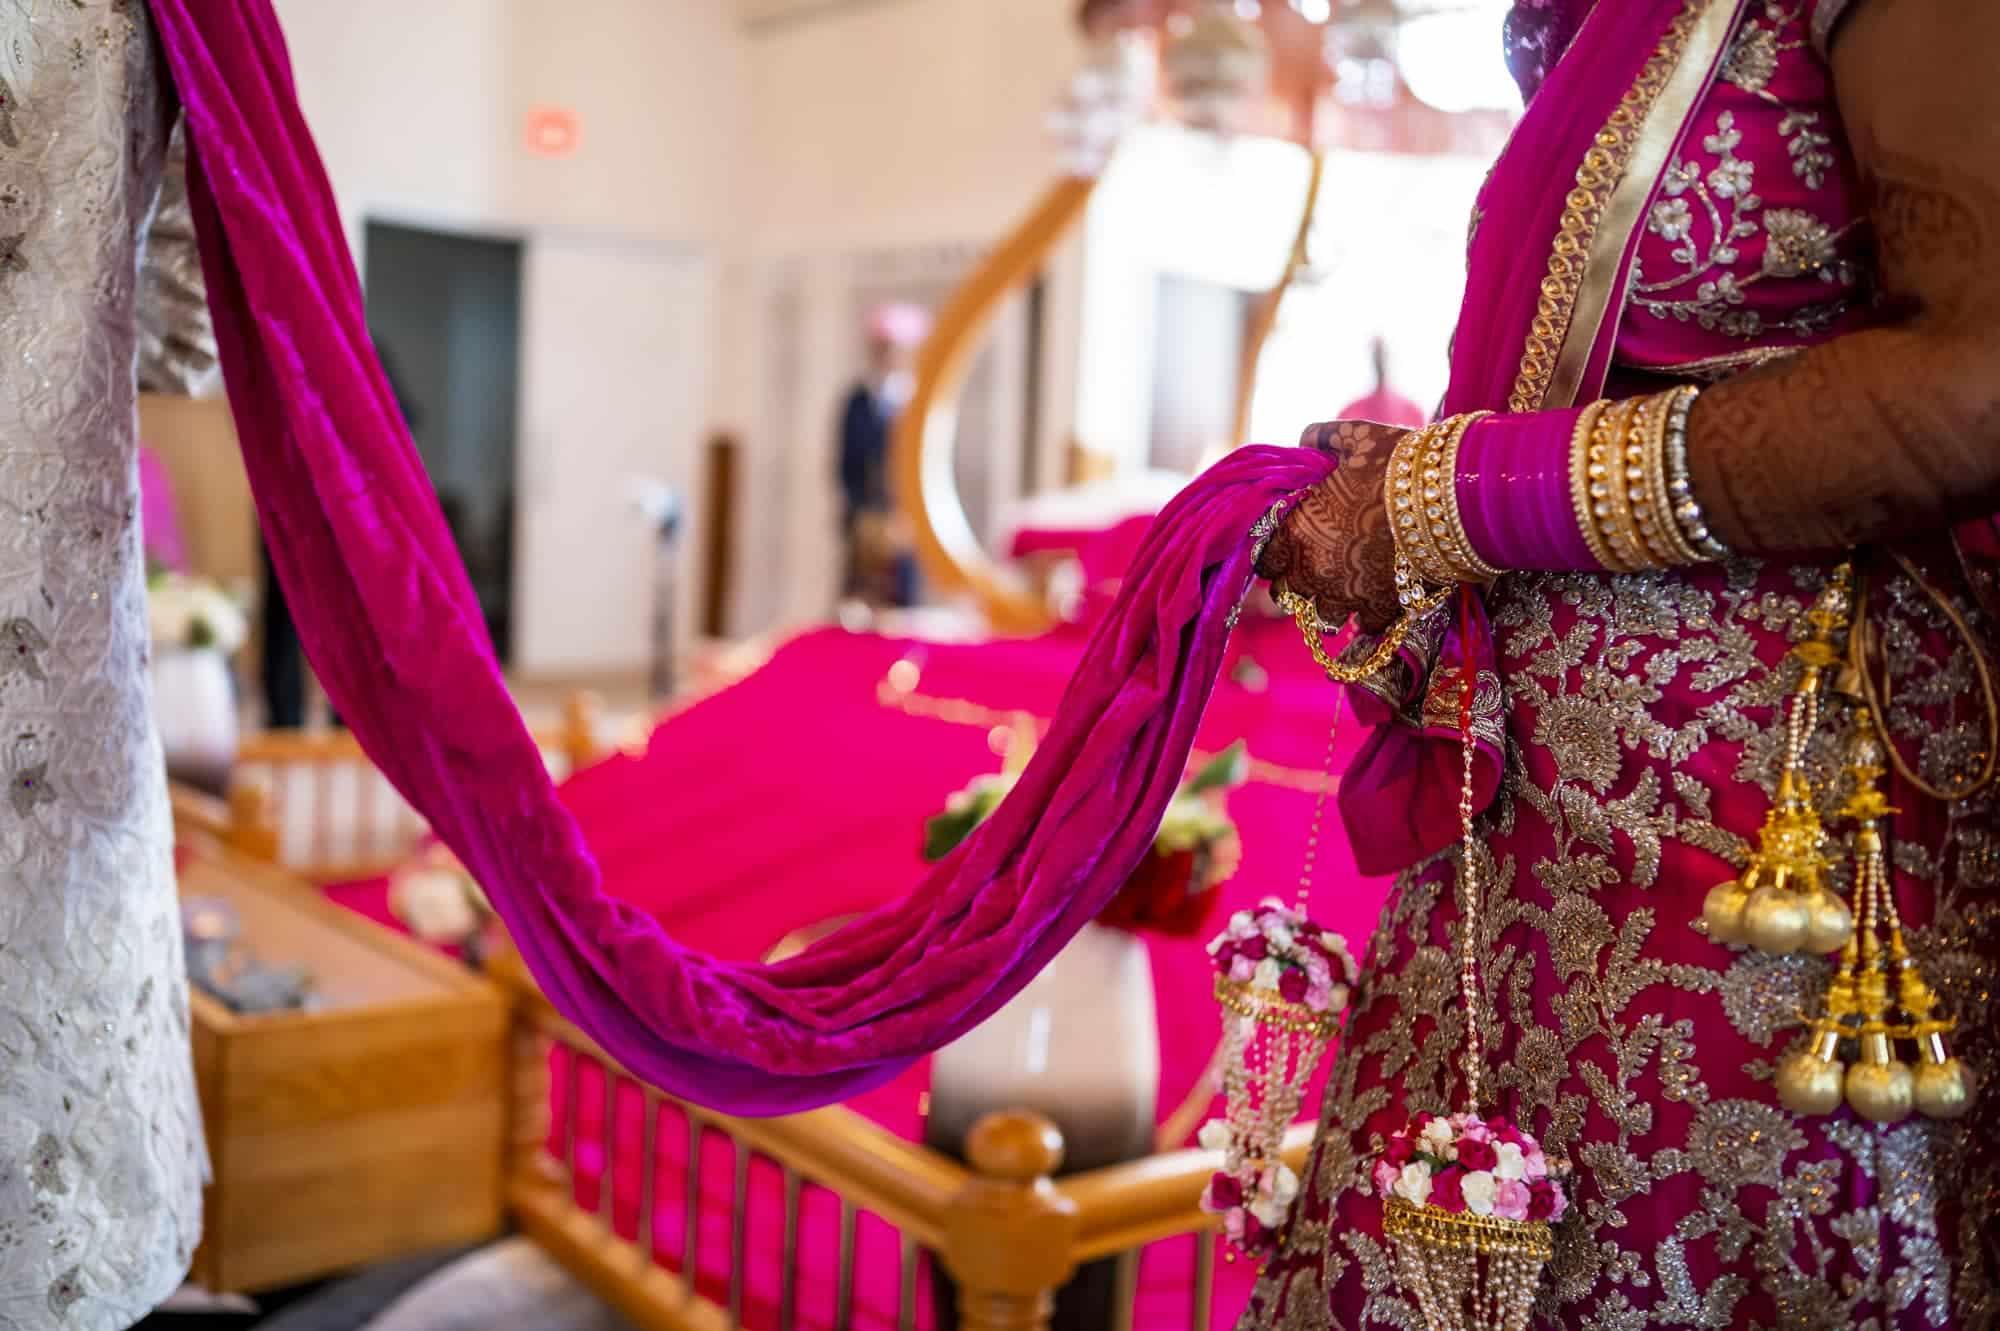 manny-gurdeep-wedding-blog2-97